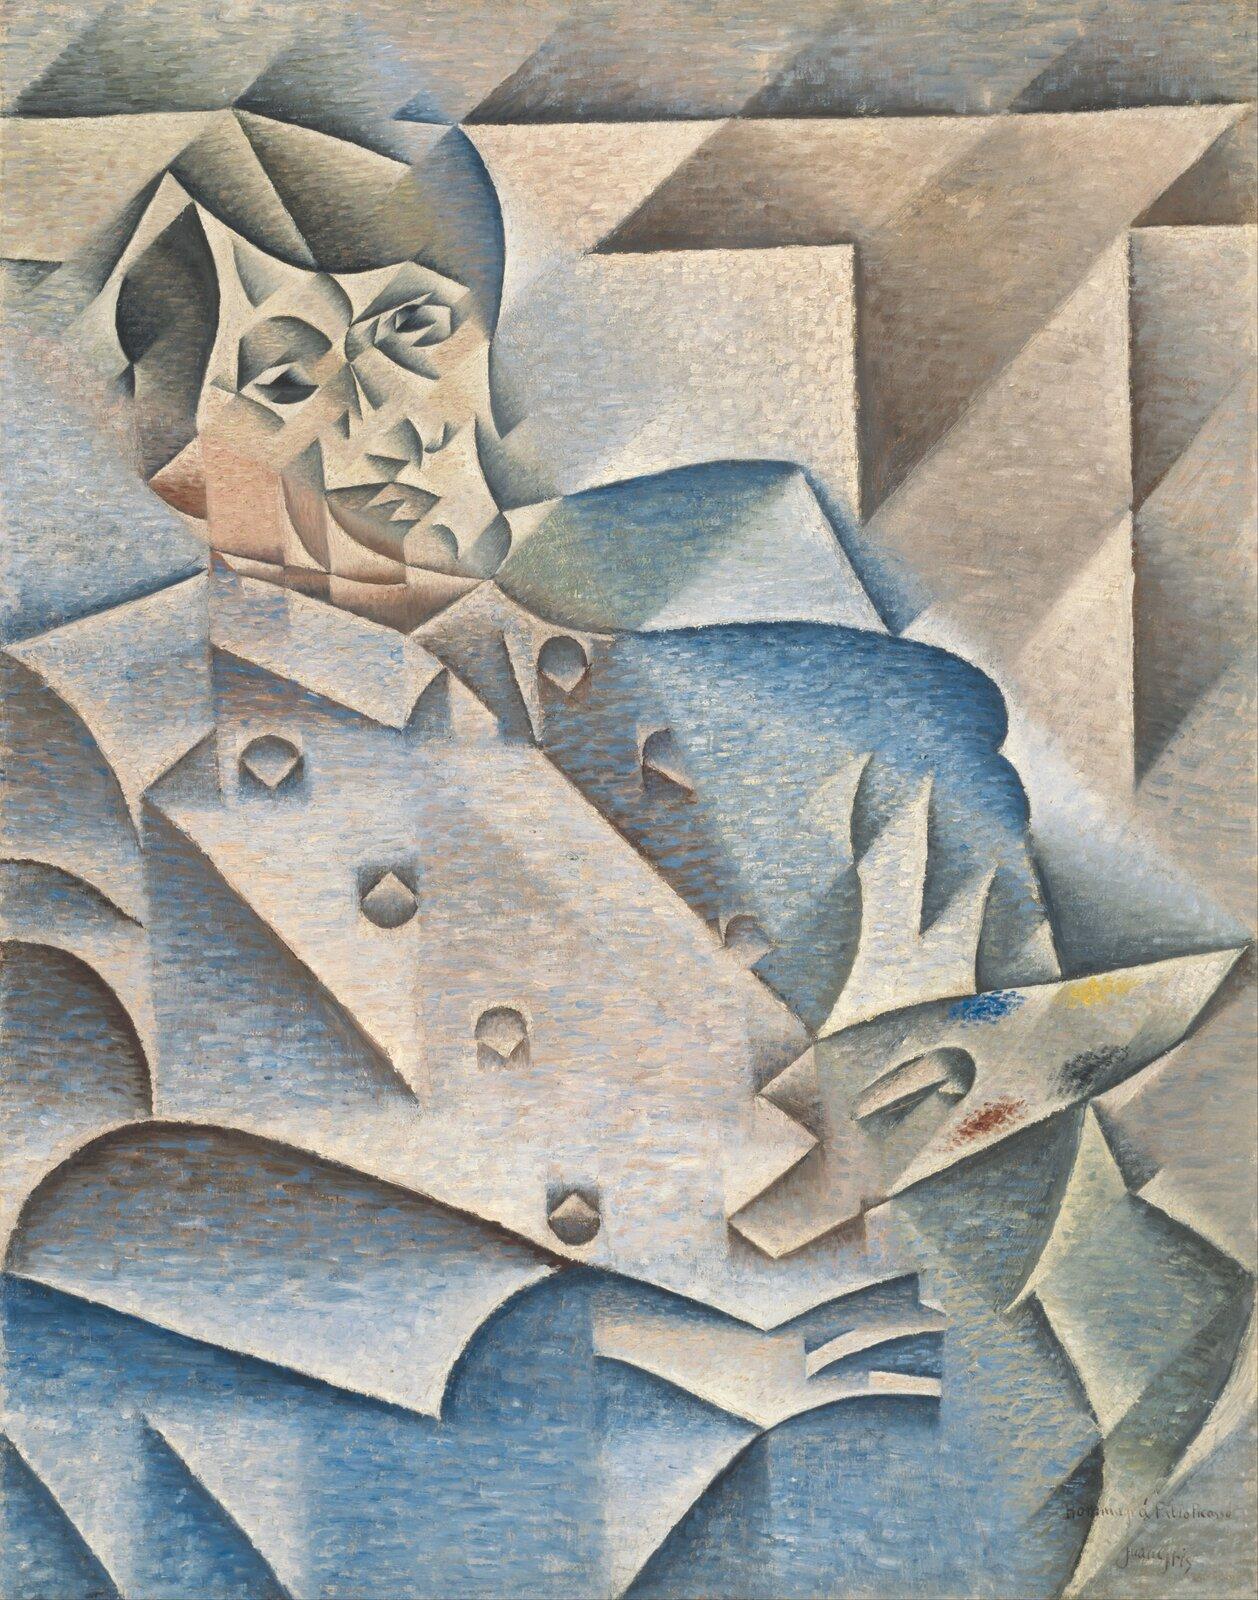 Portret Pabla Picassa Źródło: Juan Gris, Portret Pabla Picassa , Olej na płótnie, Art Institute of Chicago , domena publiczna.